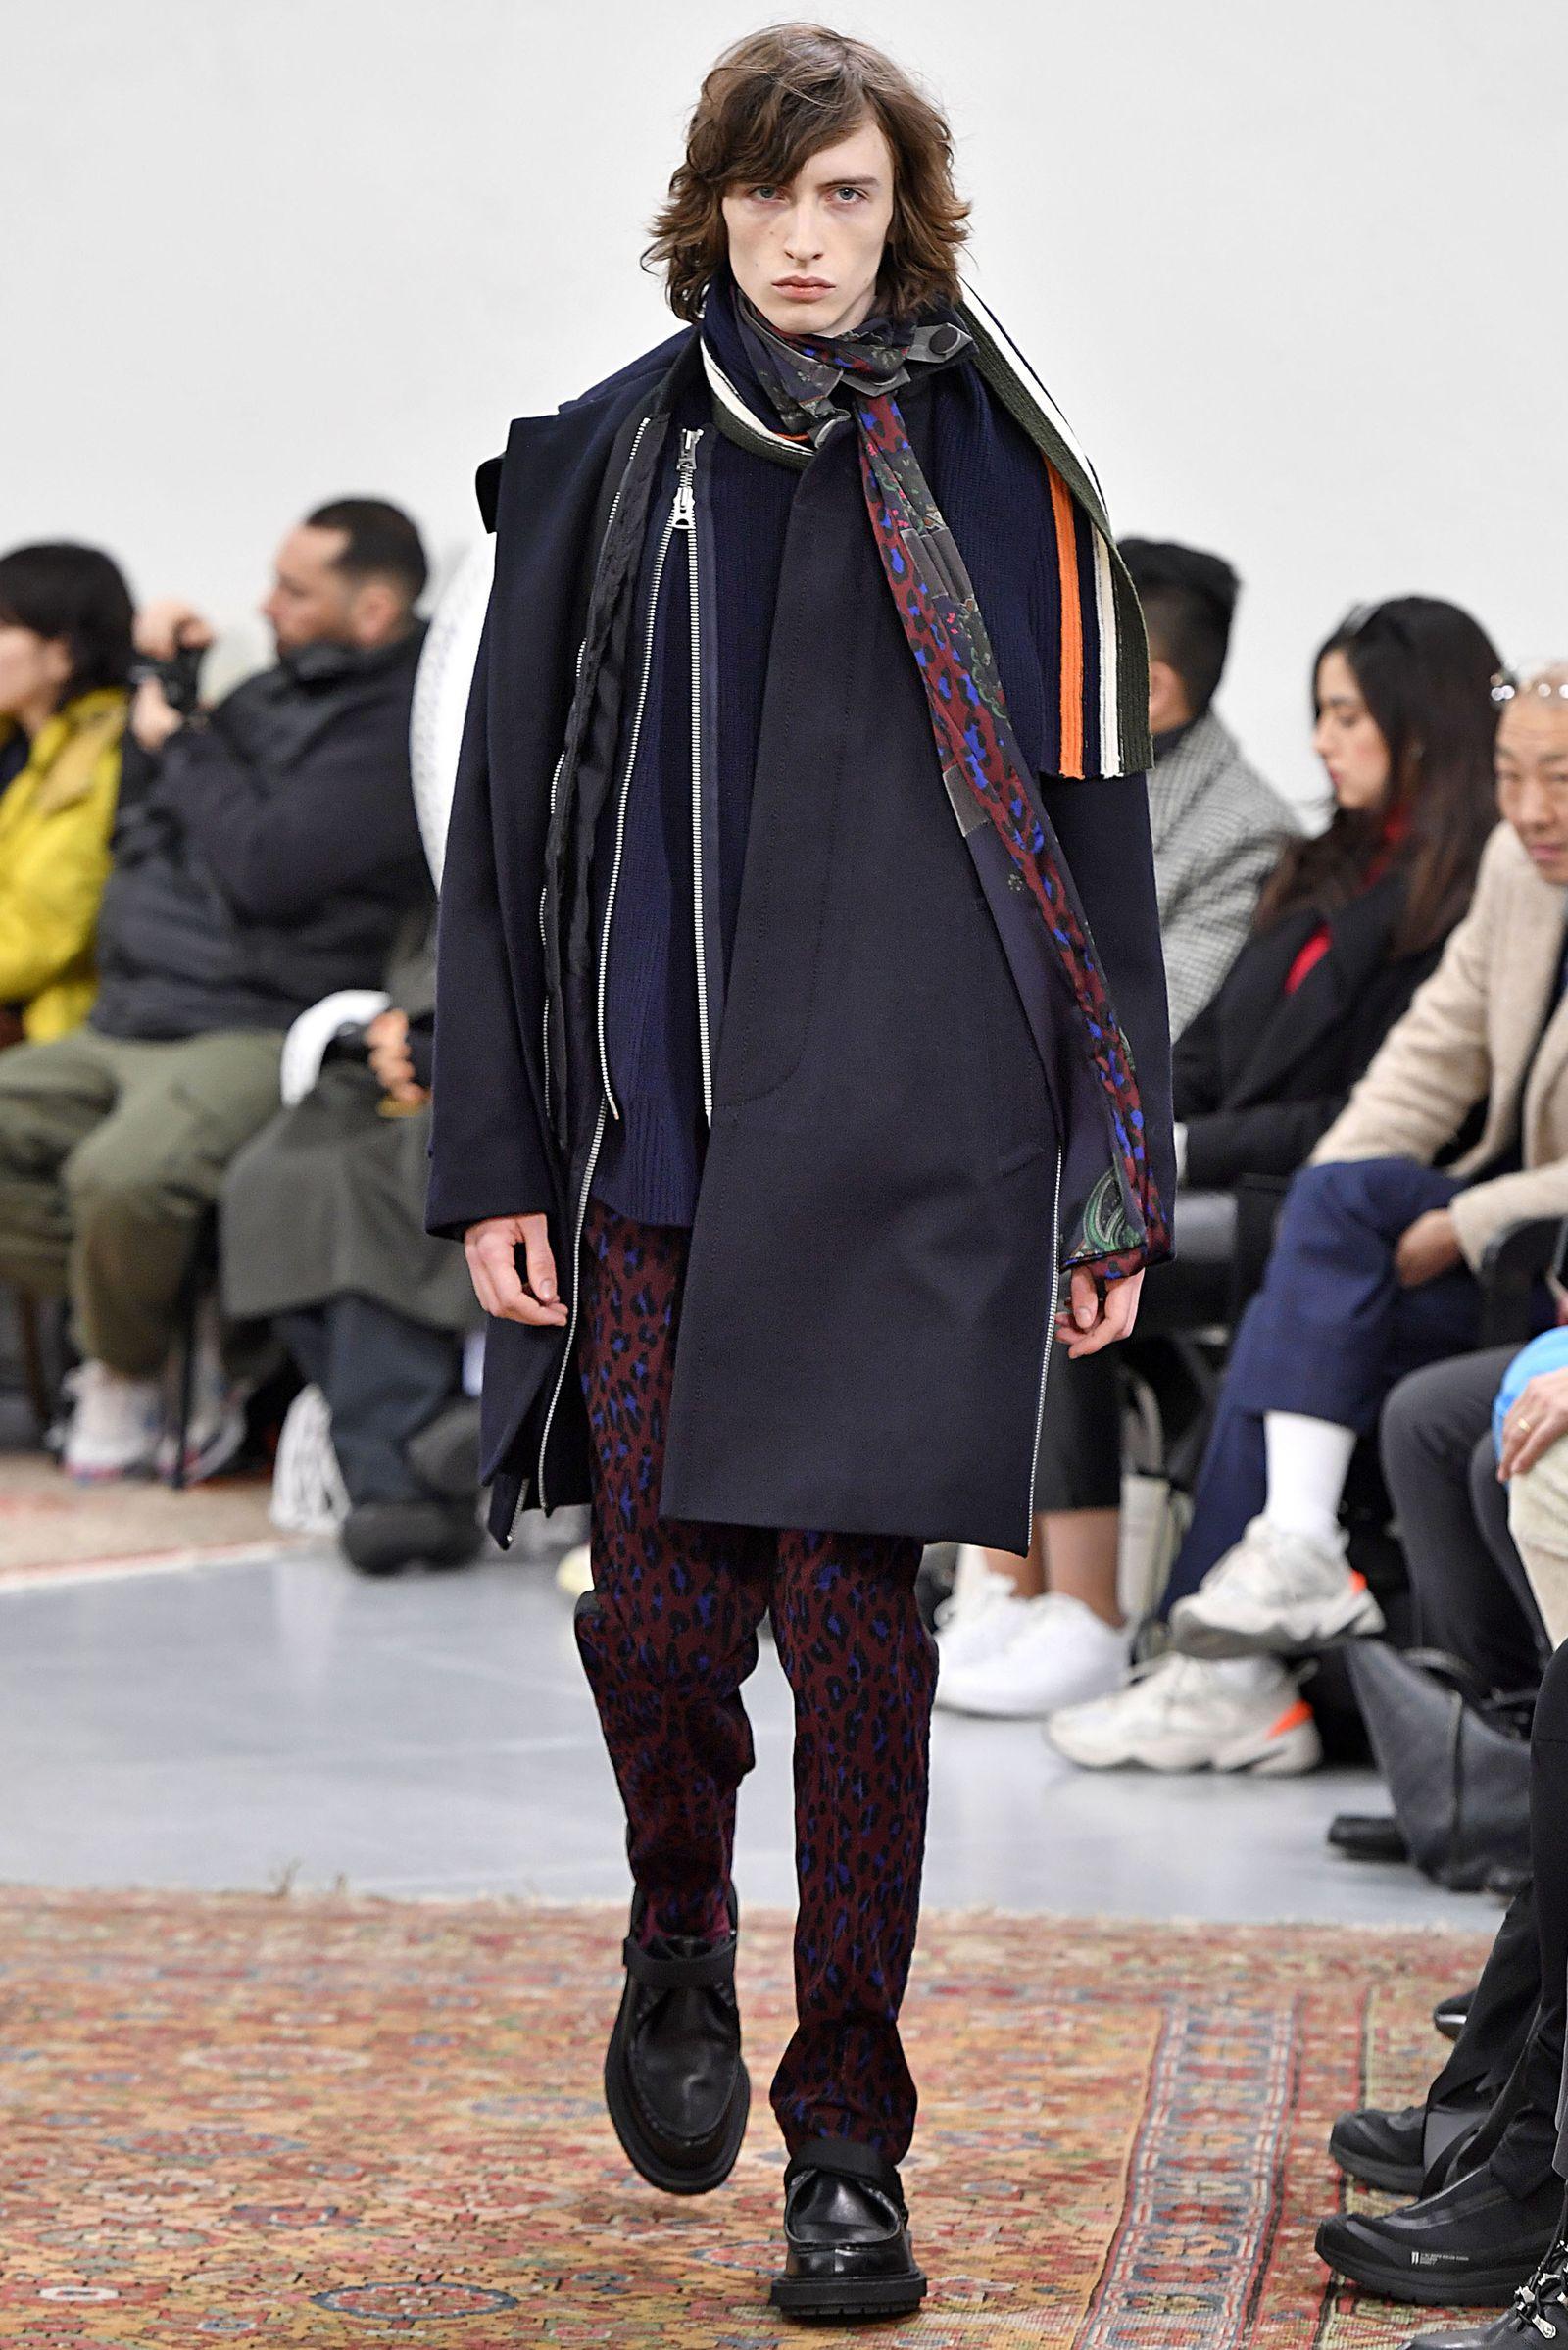 Sacai Paris Menswear Fashion Week Fall Winter 2019 Paris Jan 2019 pfw19 runway